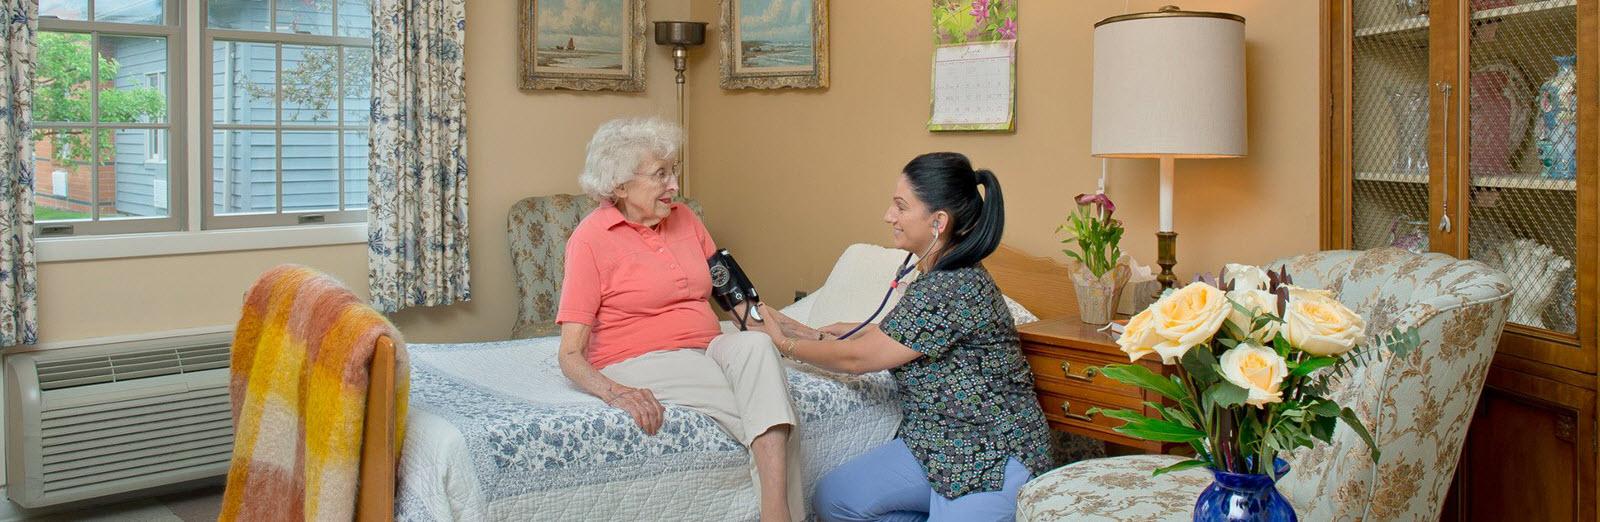 nursing home erie pa